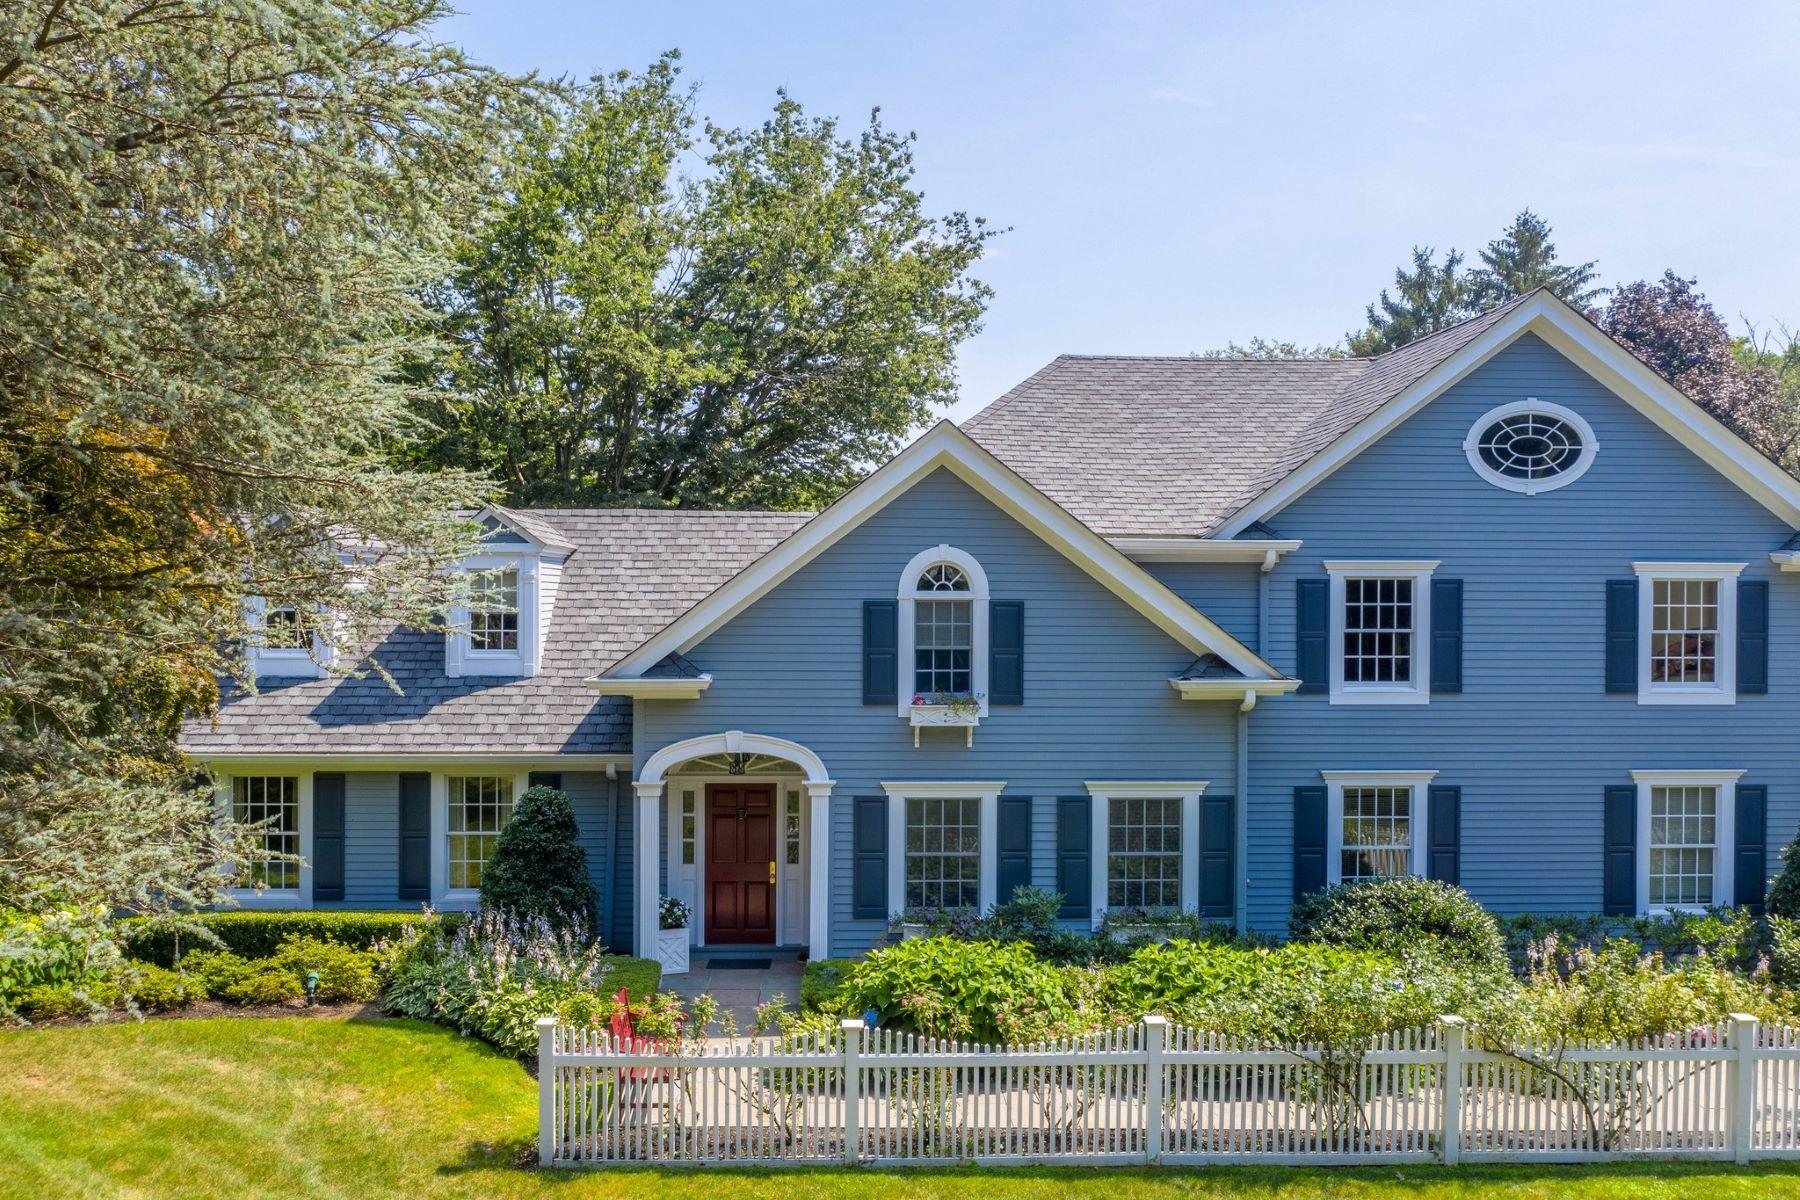 Single Family Homes for Active at Upper Brookville 51 Linden Ln Upper Brookville, New York 11545 United States